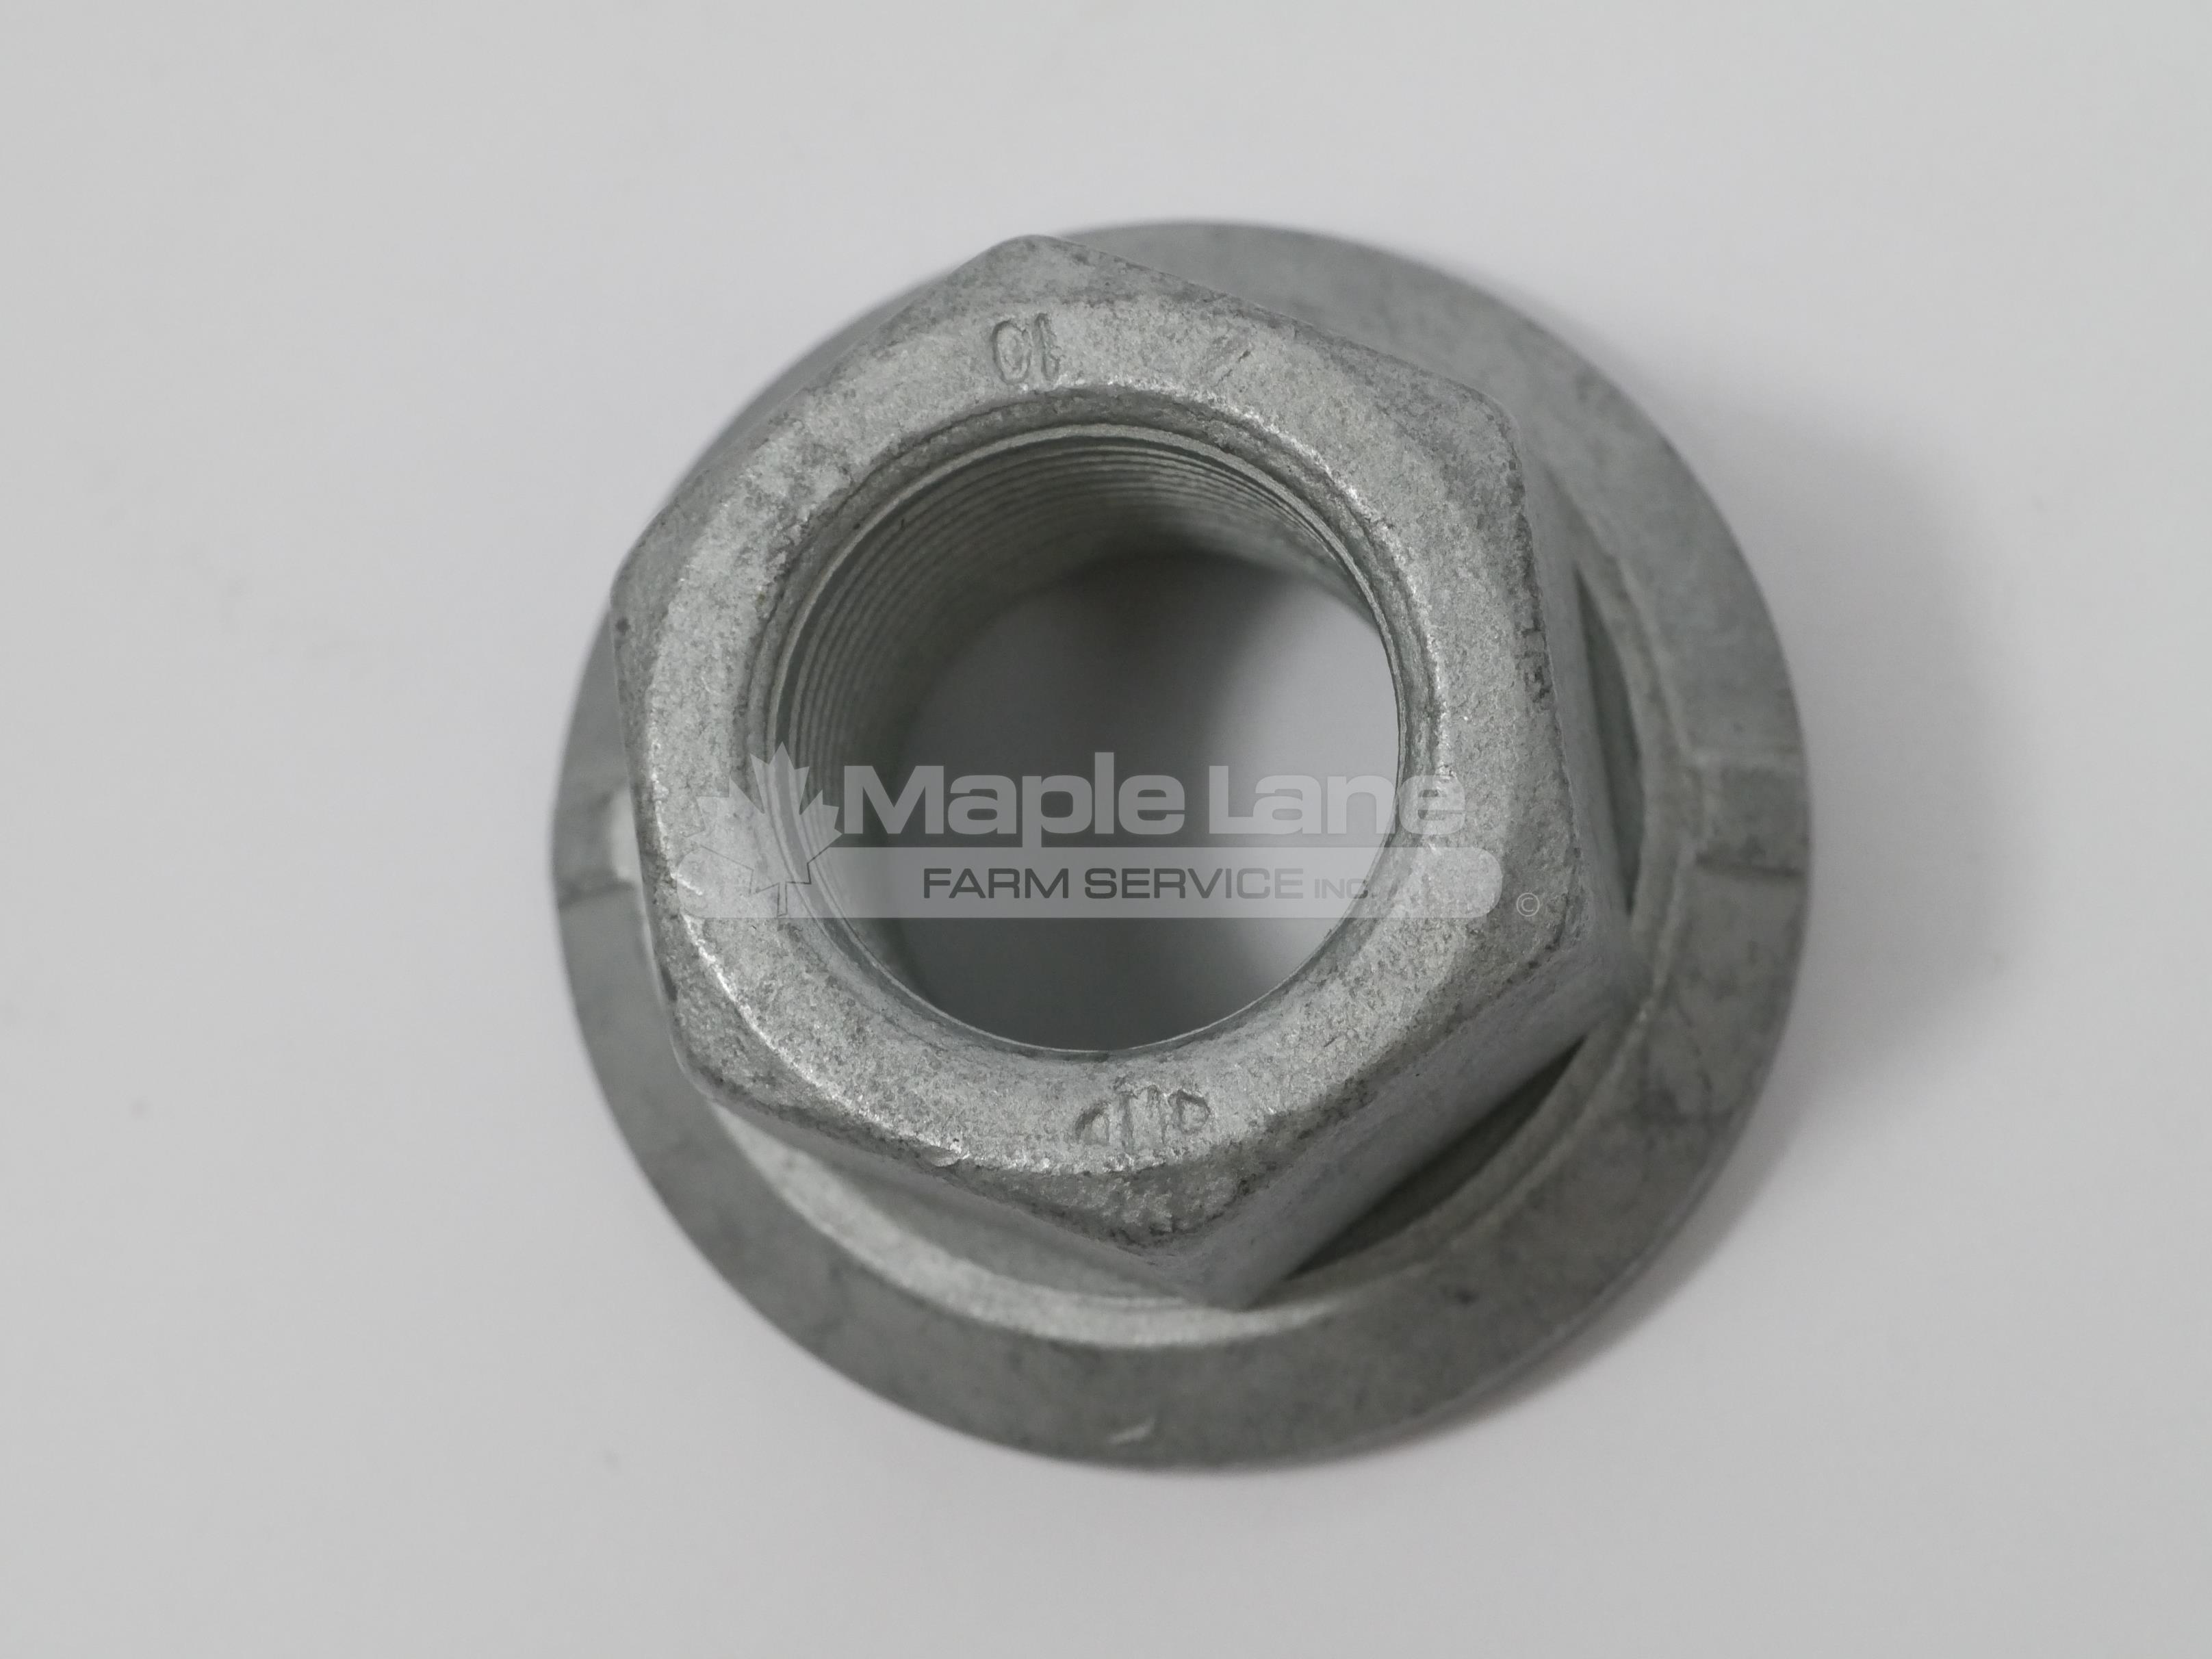 72496058 Wheel Nut M22 x 1.5